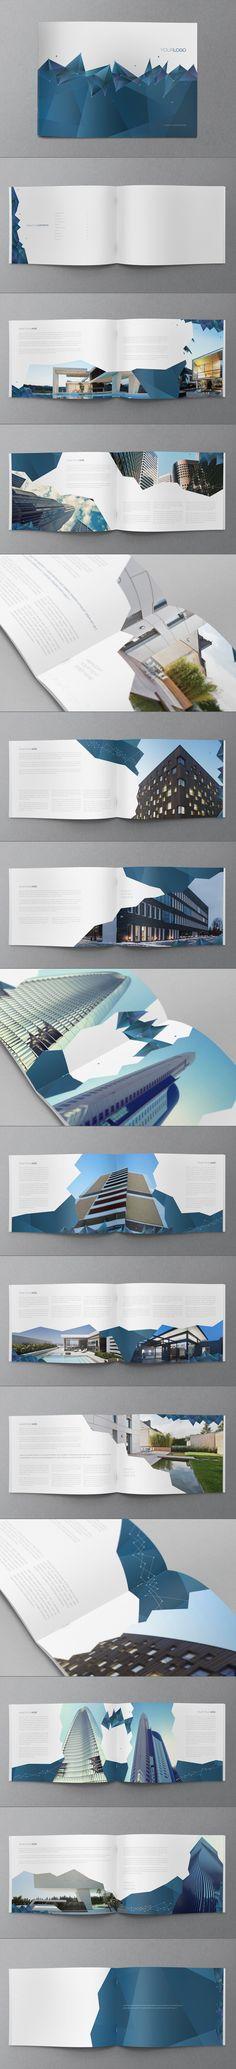 Science Brochure Design by Abra Design, via Behance